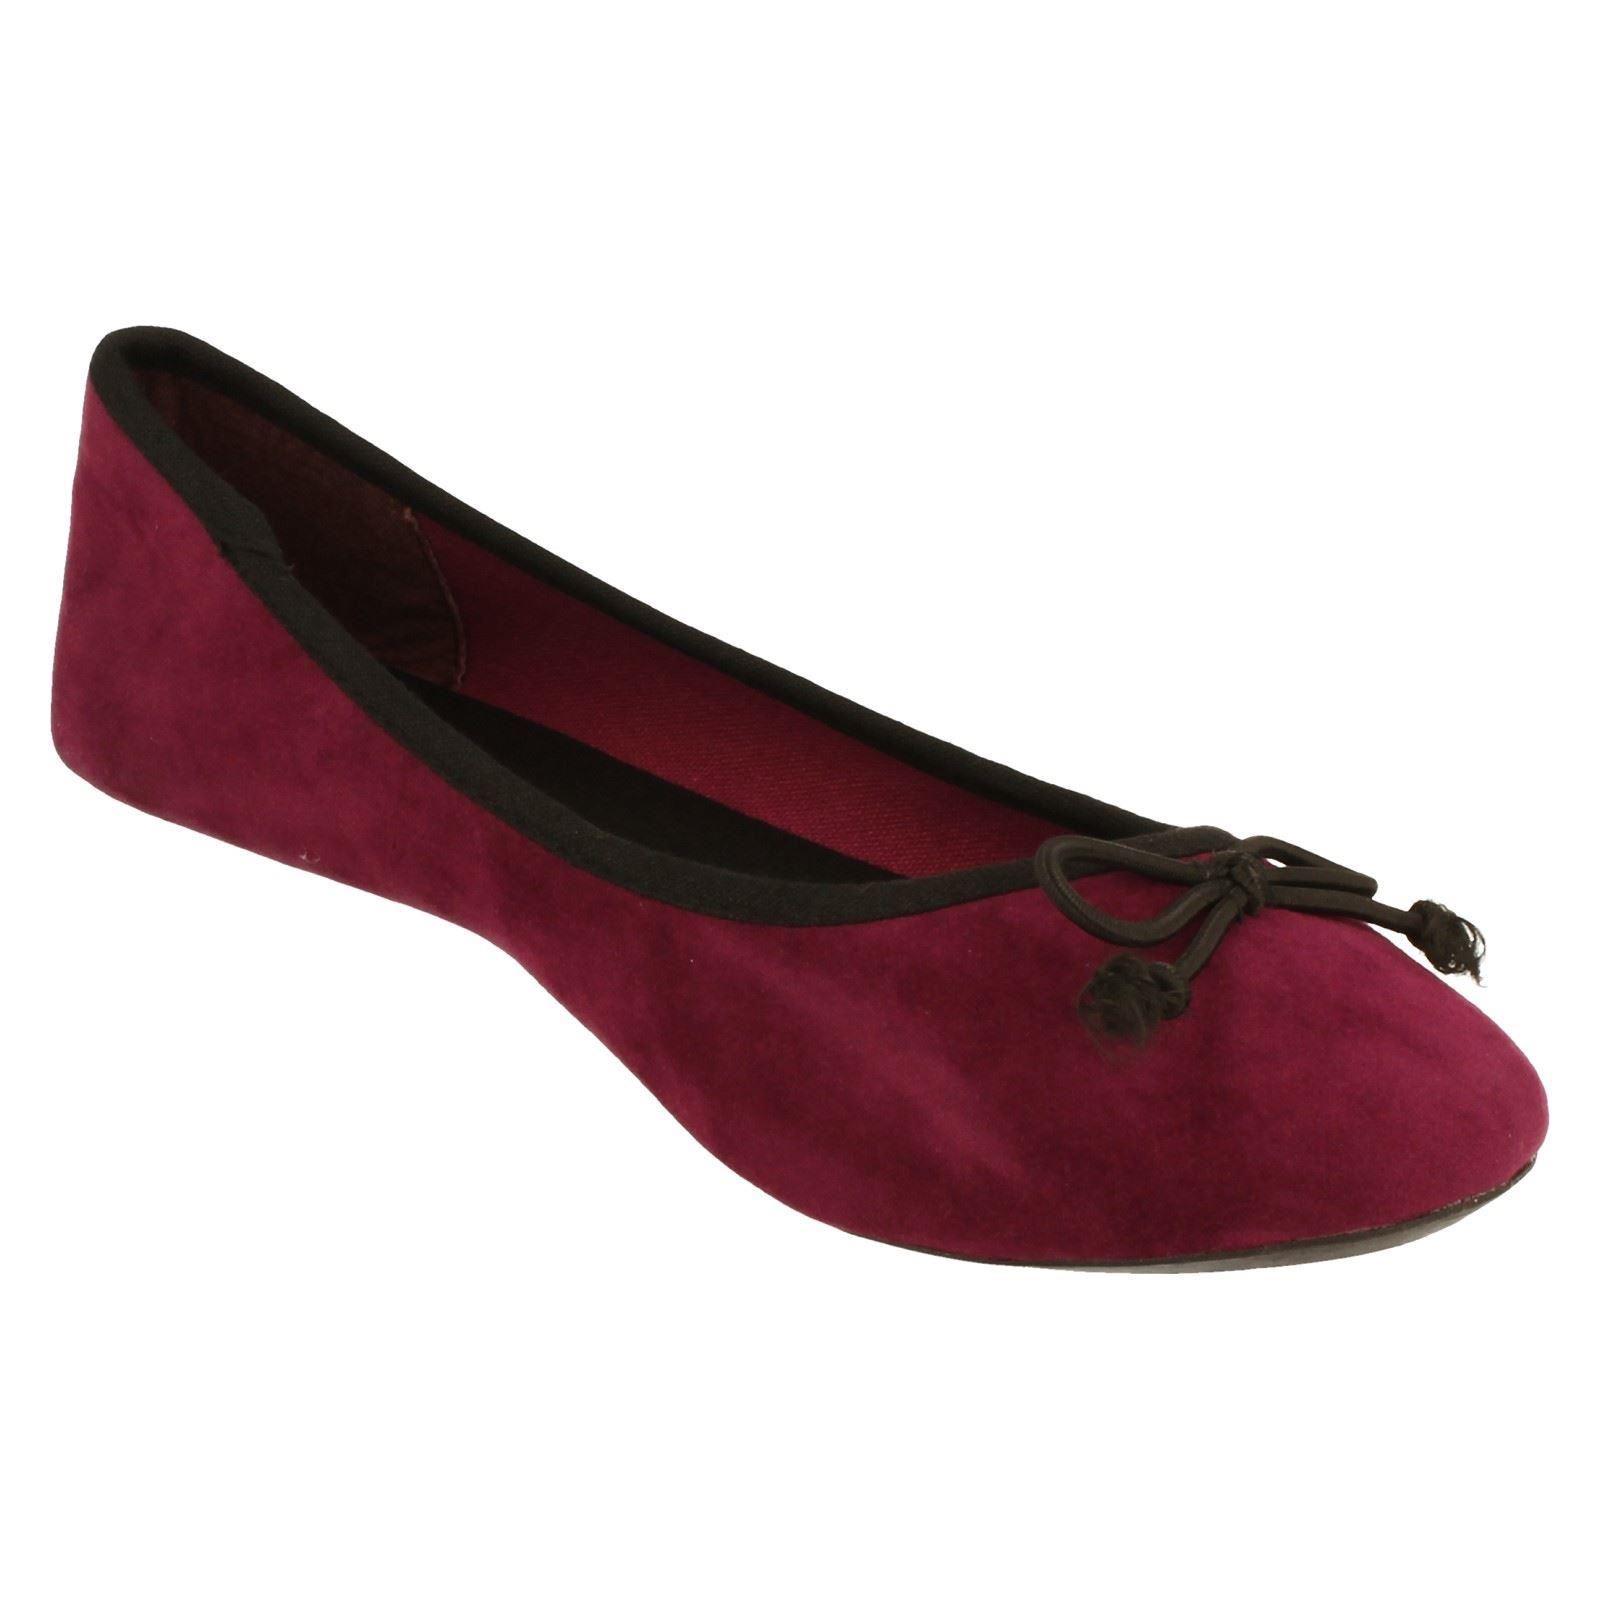 Damas Spot On Zapatos Planos Estilo - f8855